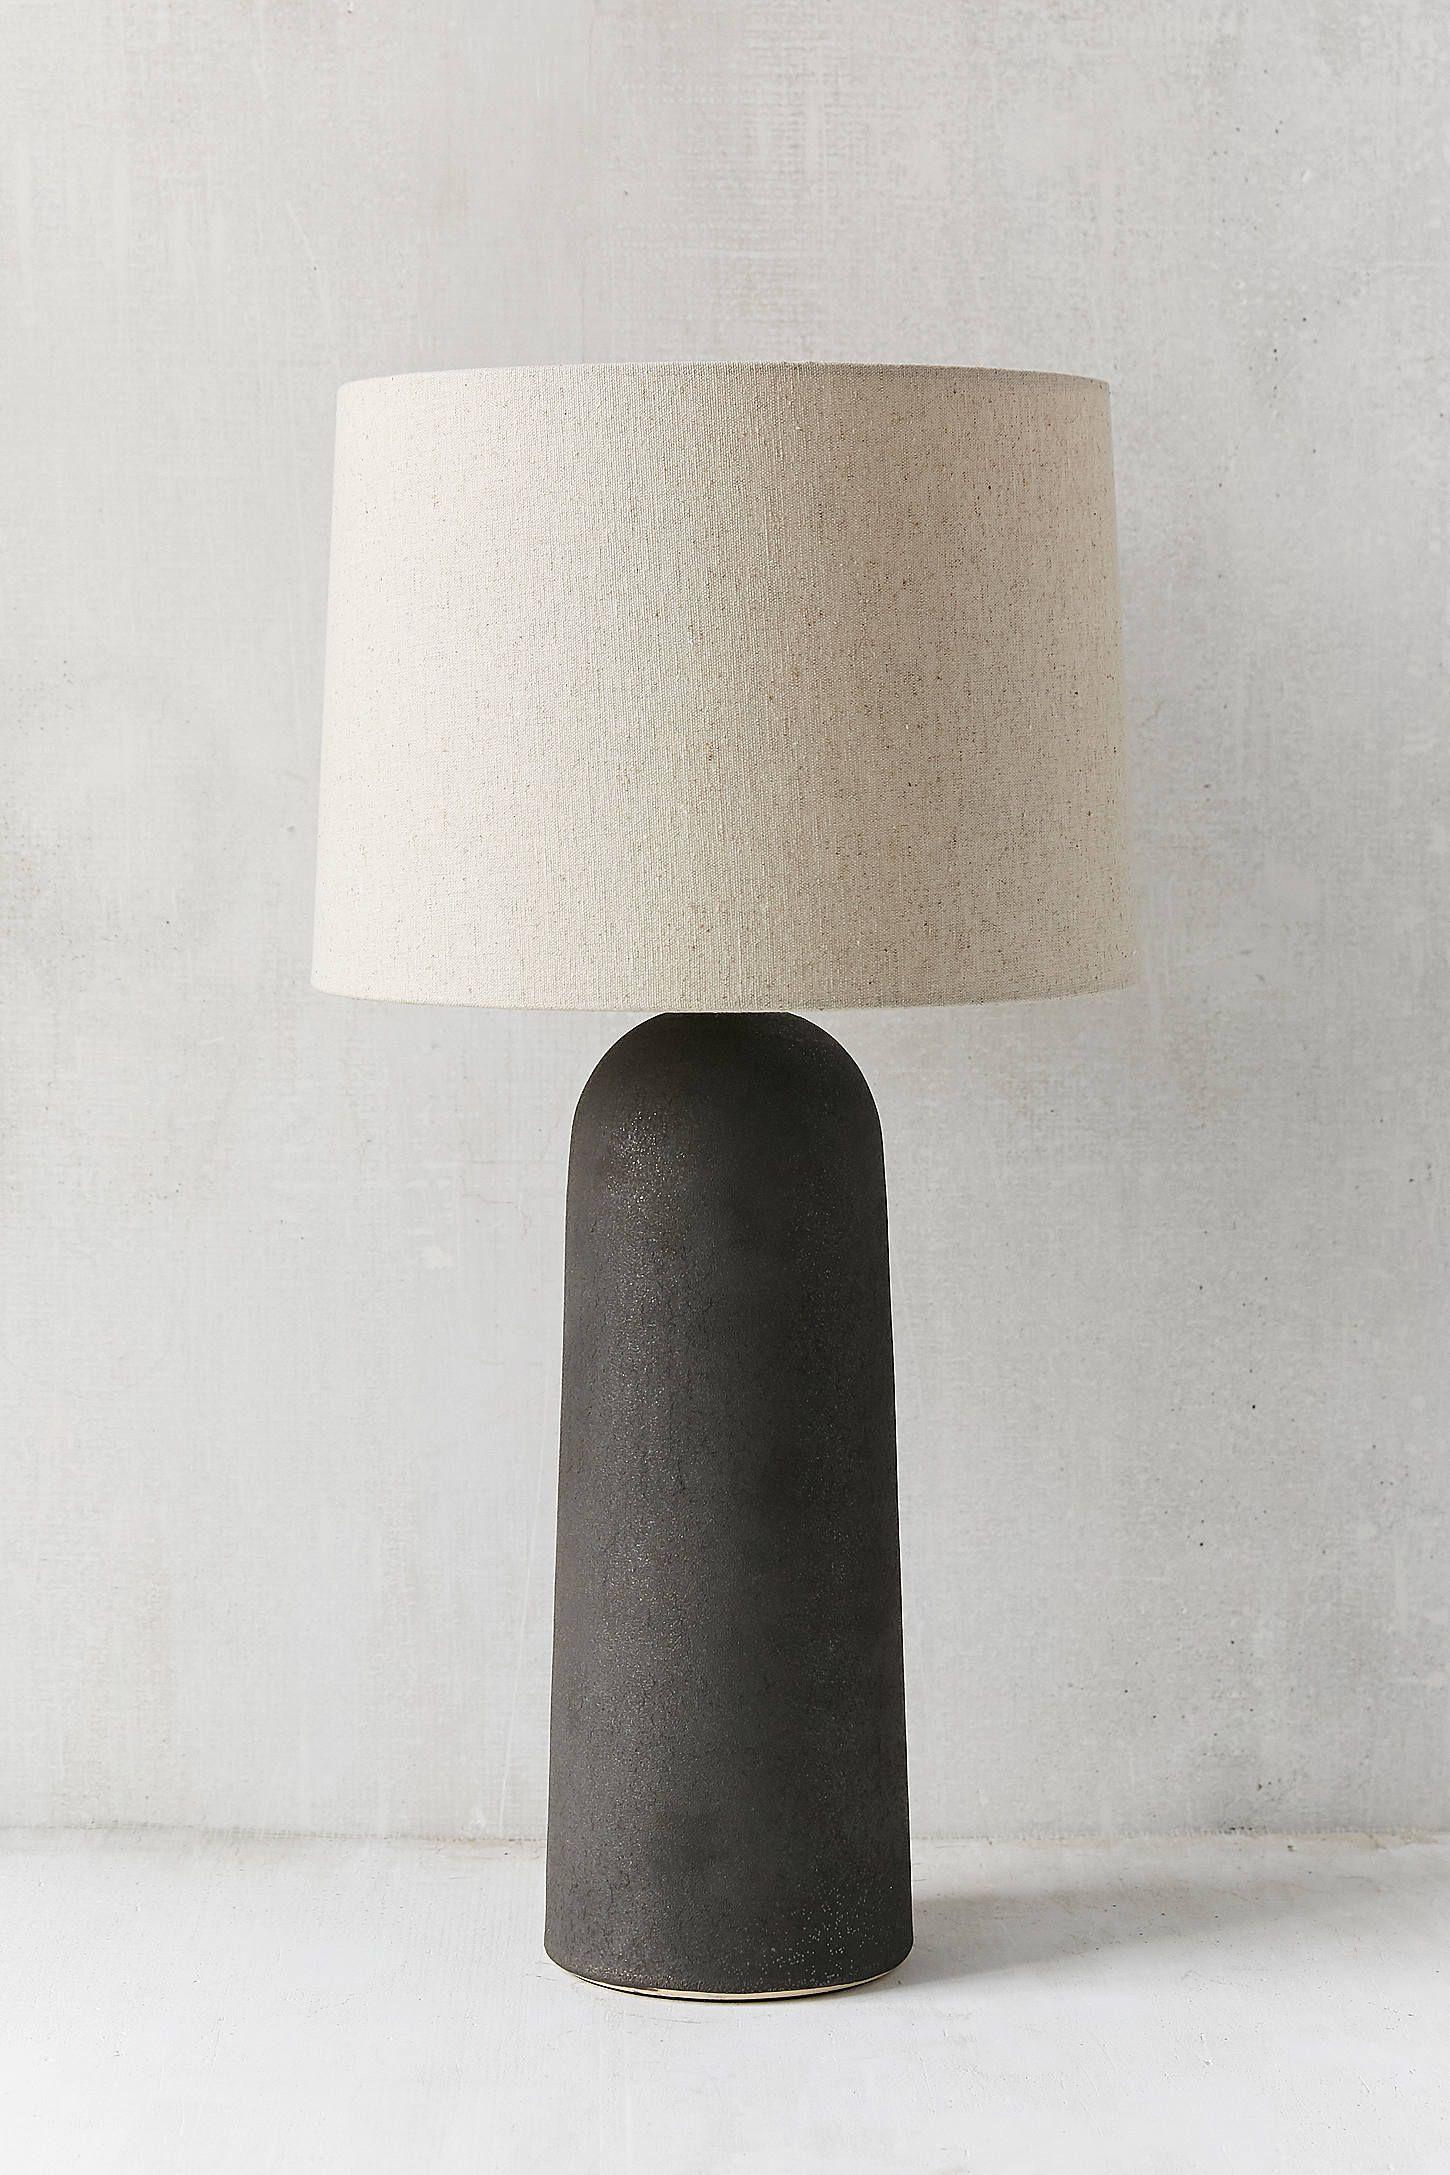 Clarke Ceramic Table Lamp Table Lamp Design Ceramic Table Lamps